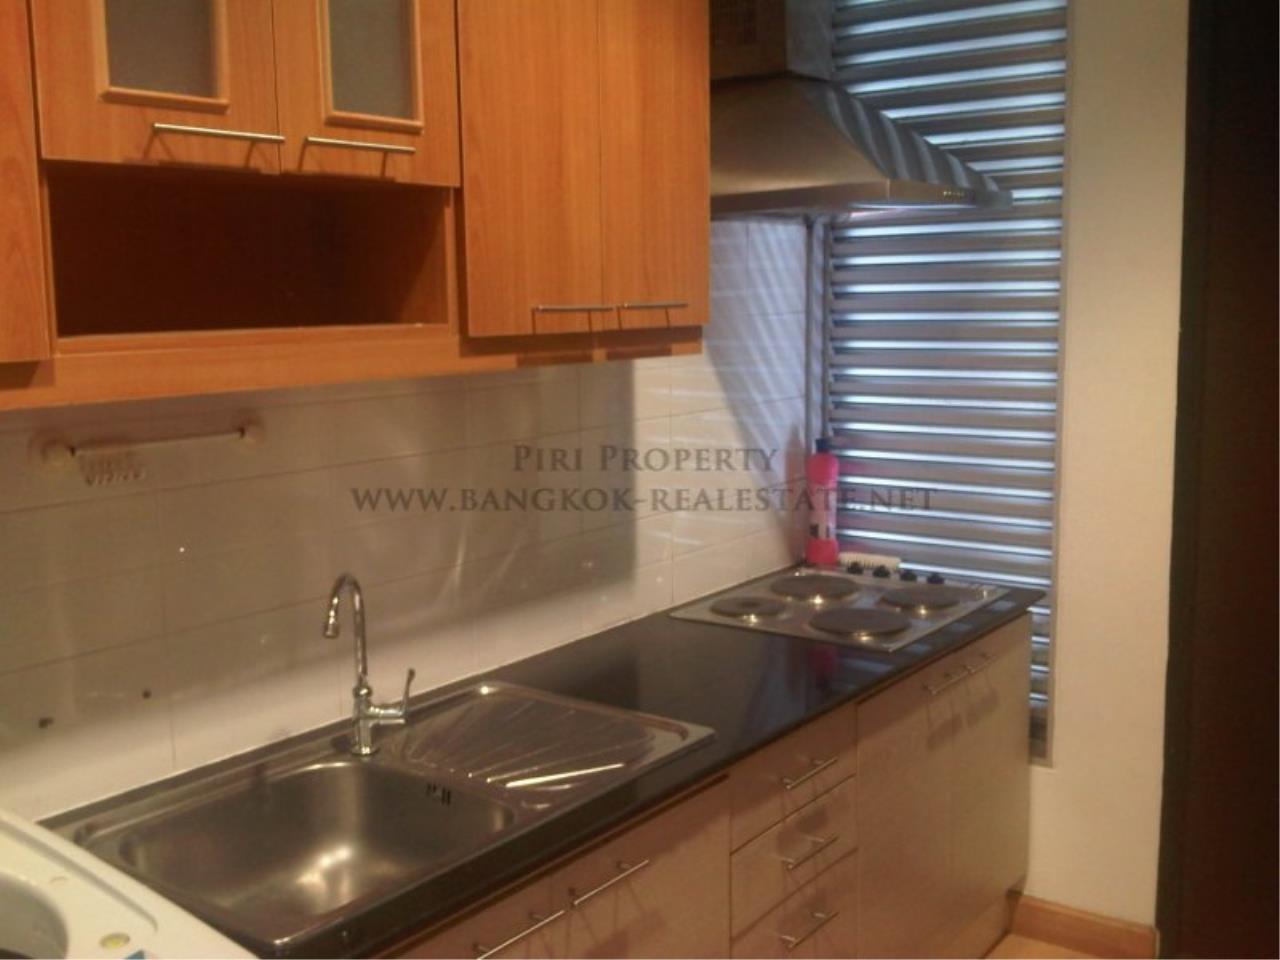 Piri Property Agency's 3 Bedroom Penthouse Unit - AP Citismart for Rent 9